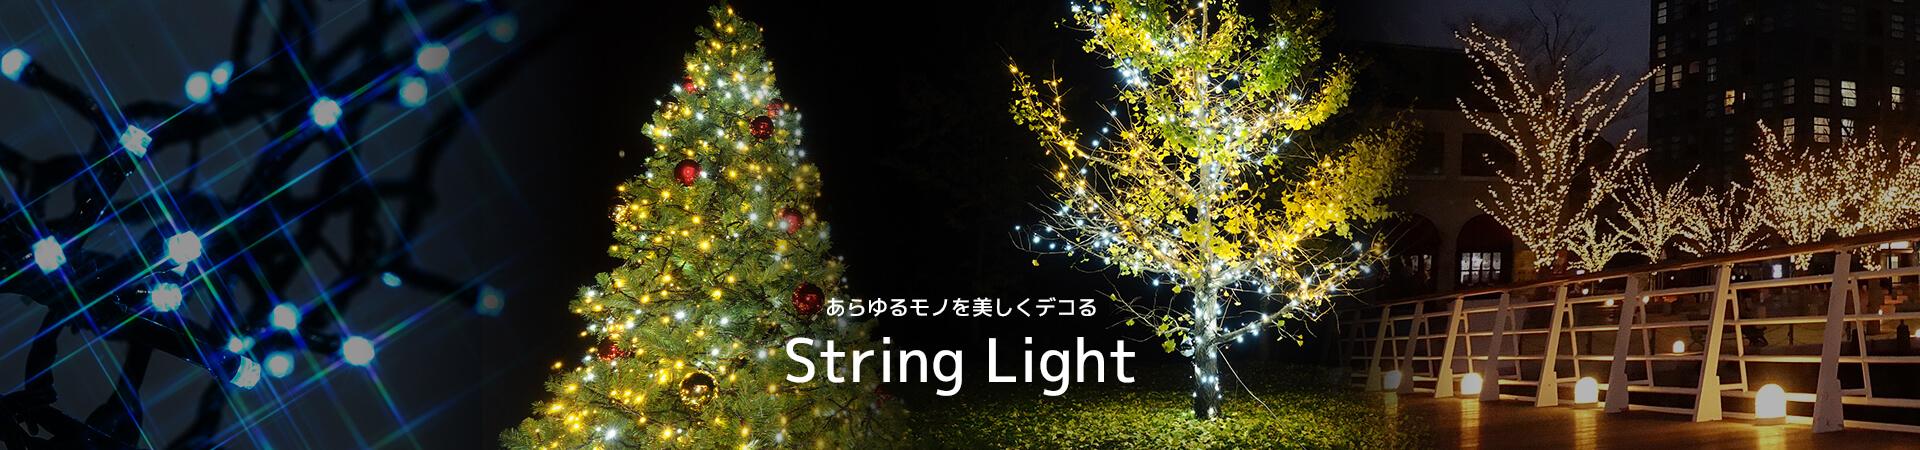 LEDイルミネーション ストリングライトライト